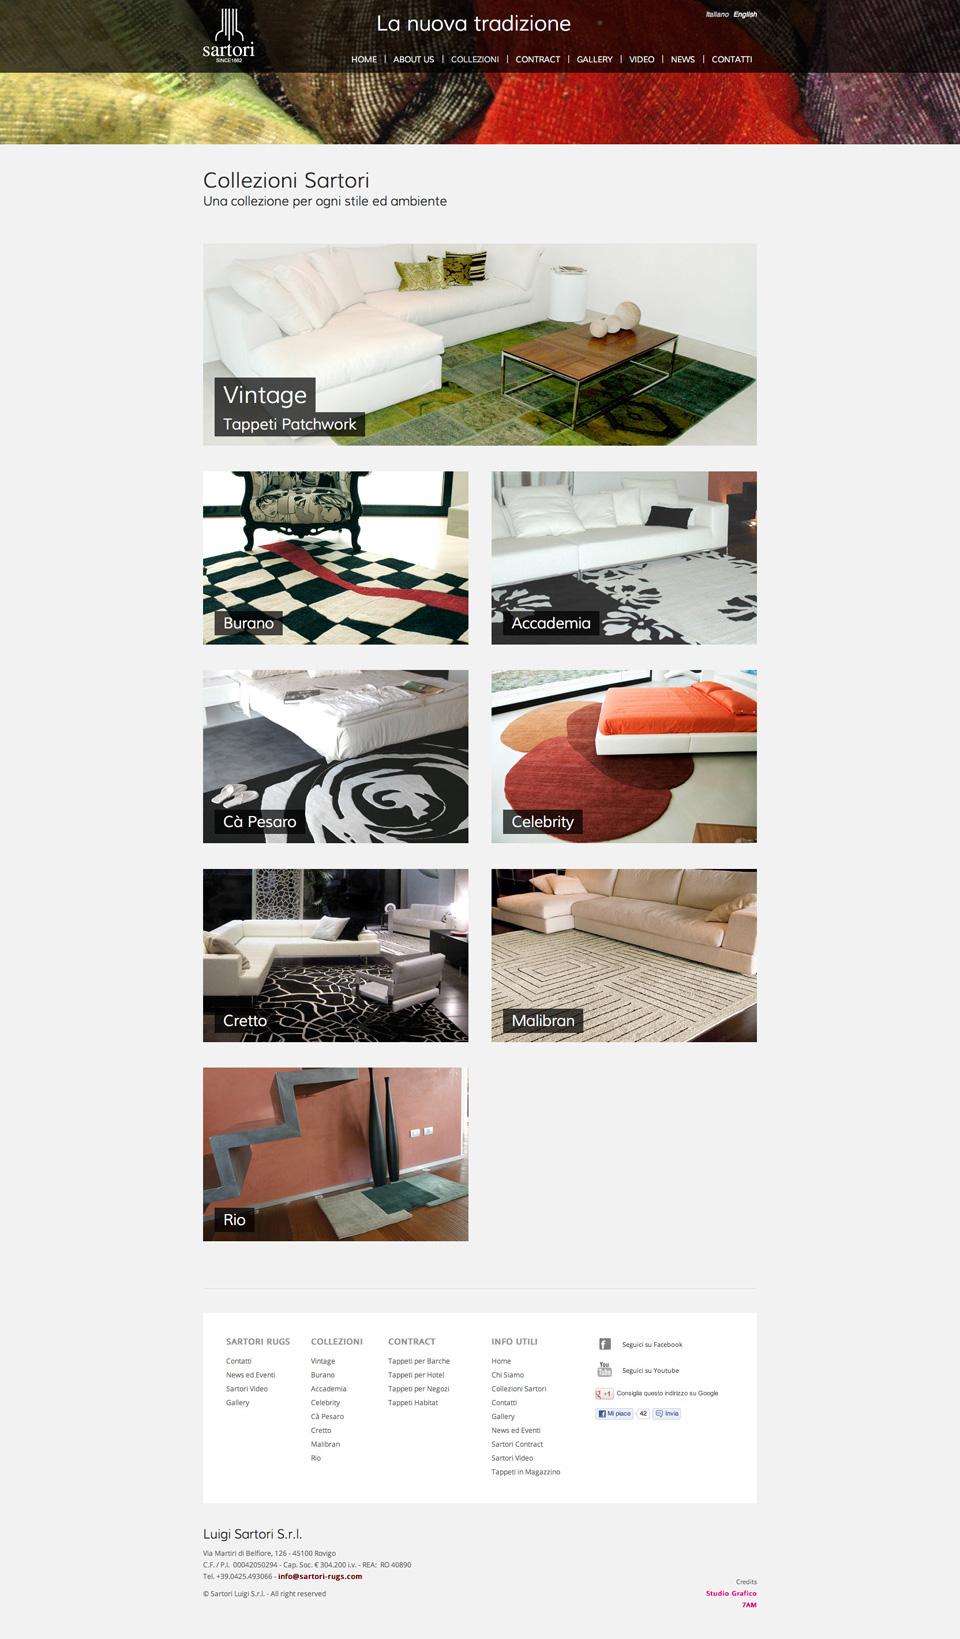 Sartori rugs 2012 studio 7am studio grafico padova - Sartori tappeti rovigo ...